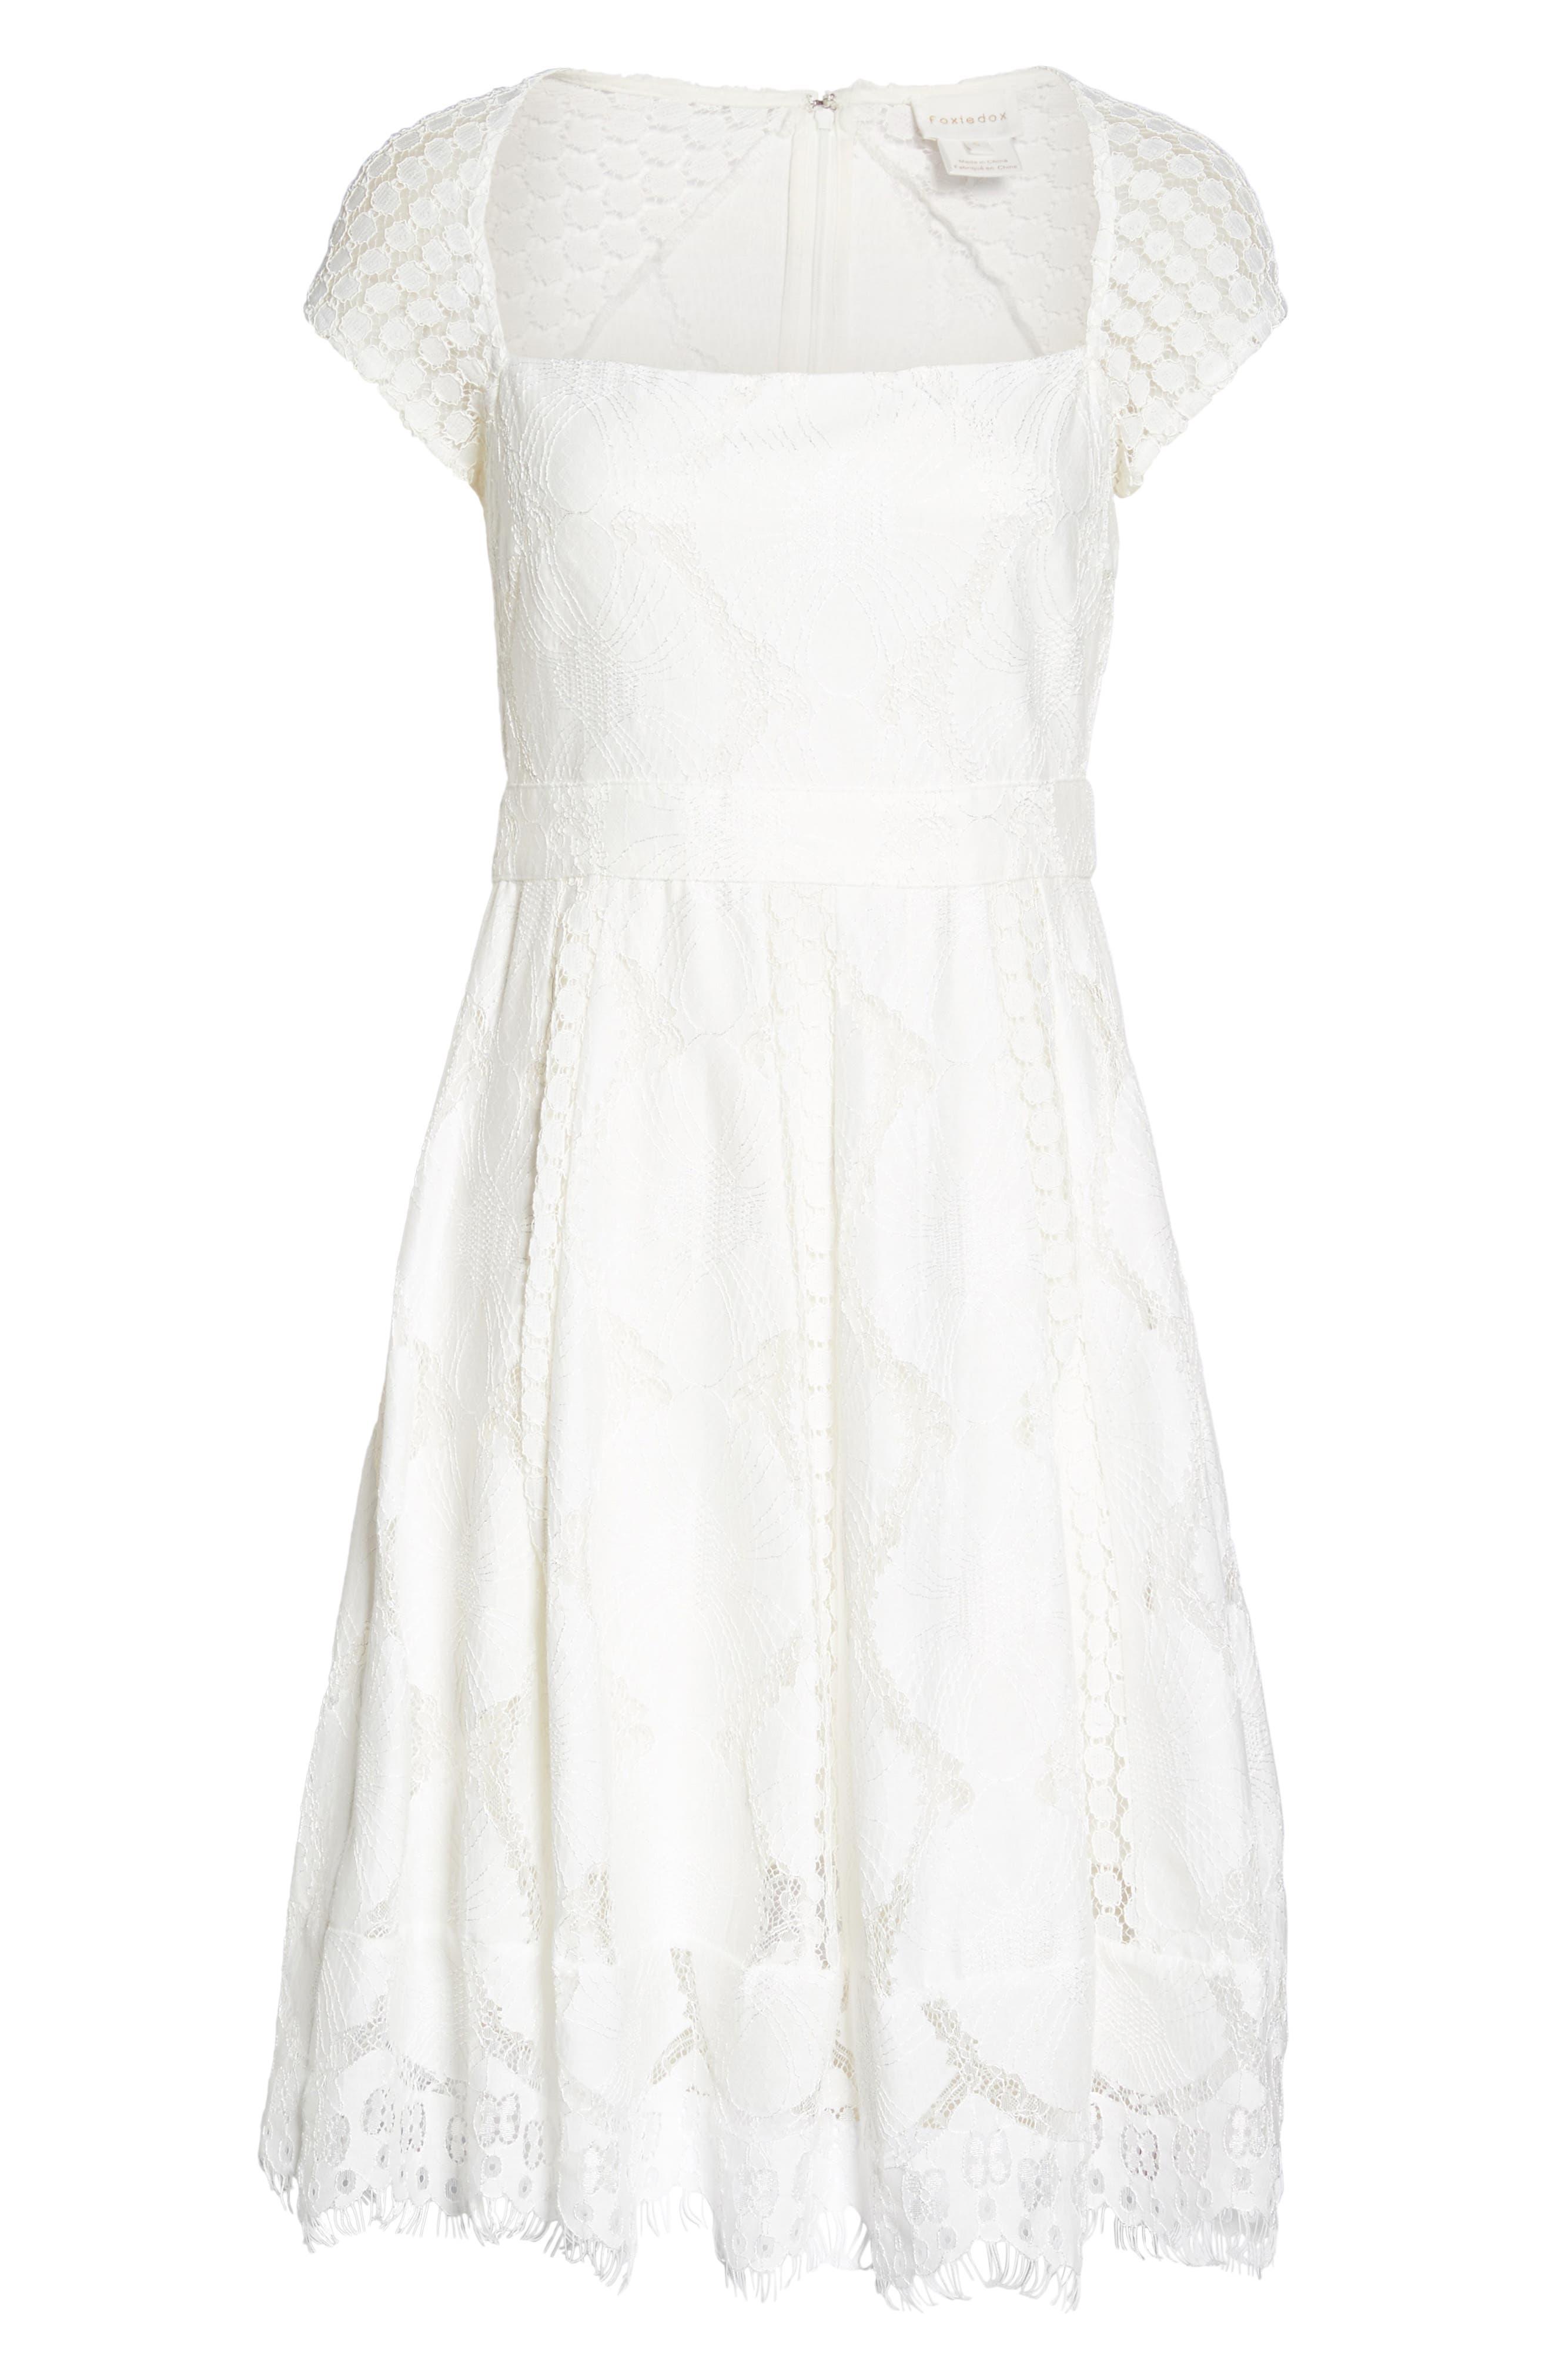 Theodora Lace Dress,                             Alternate thumbnail 6, color,                             White